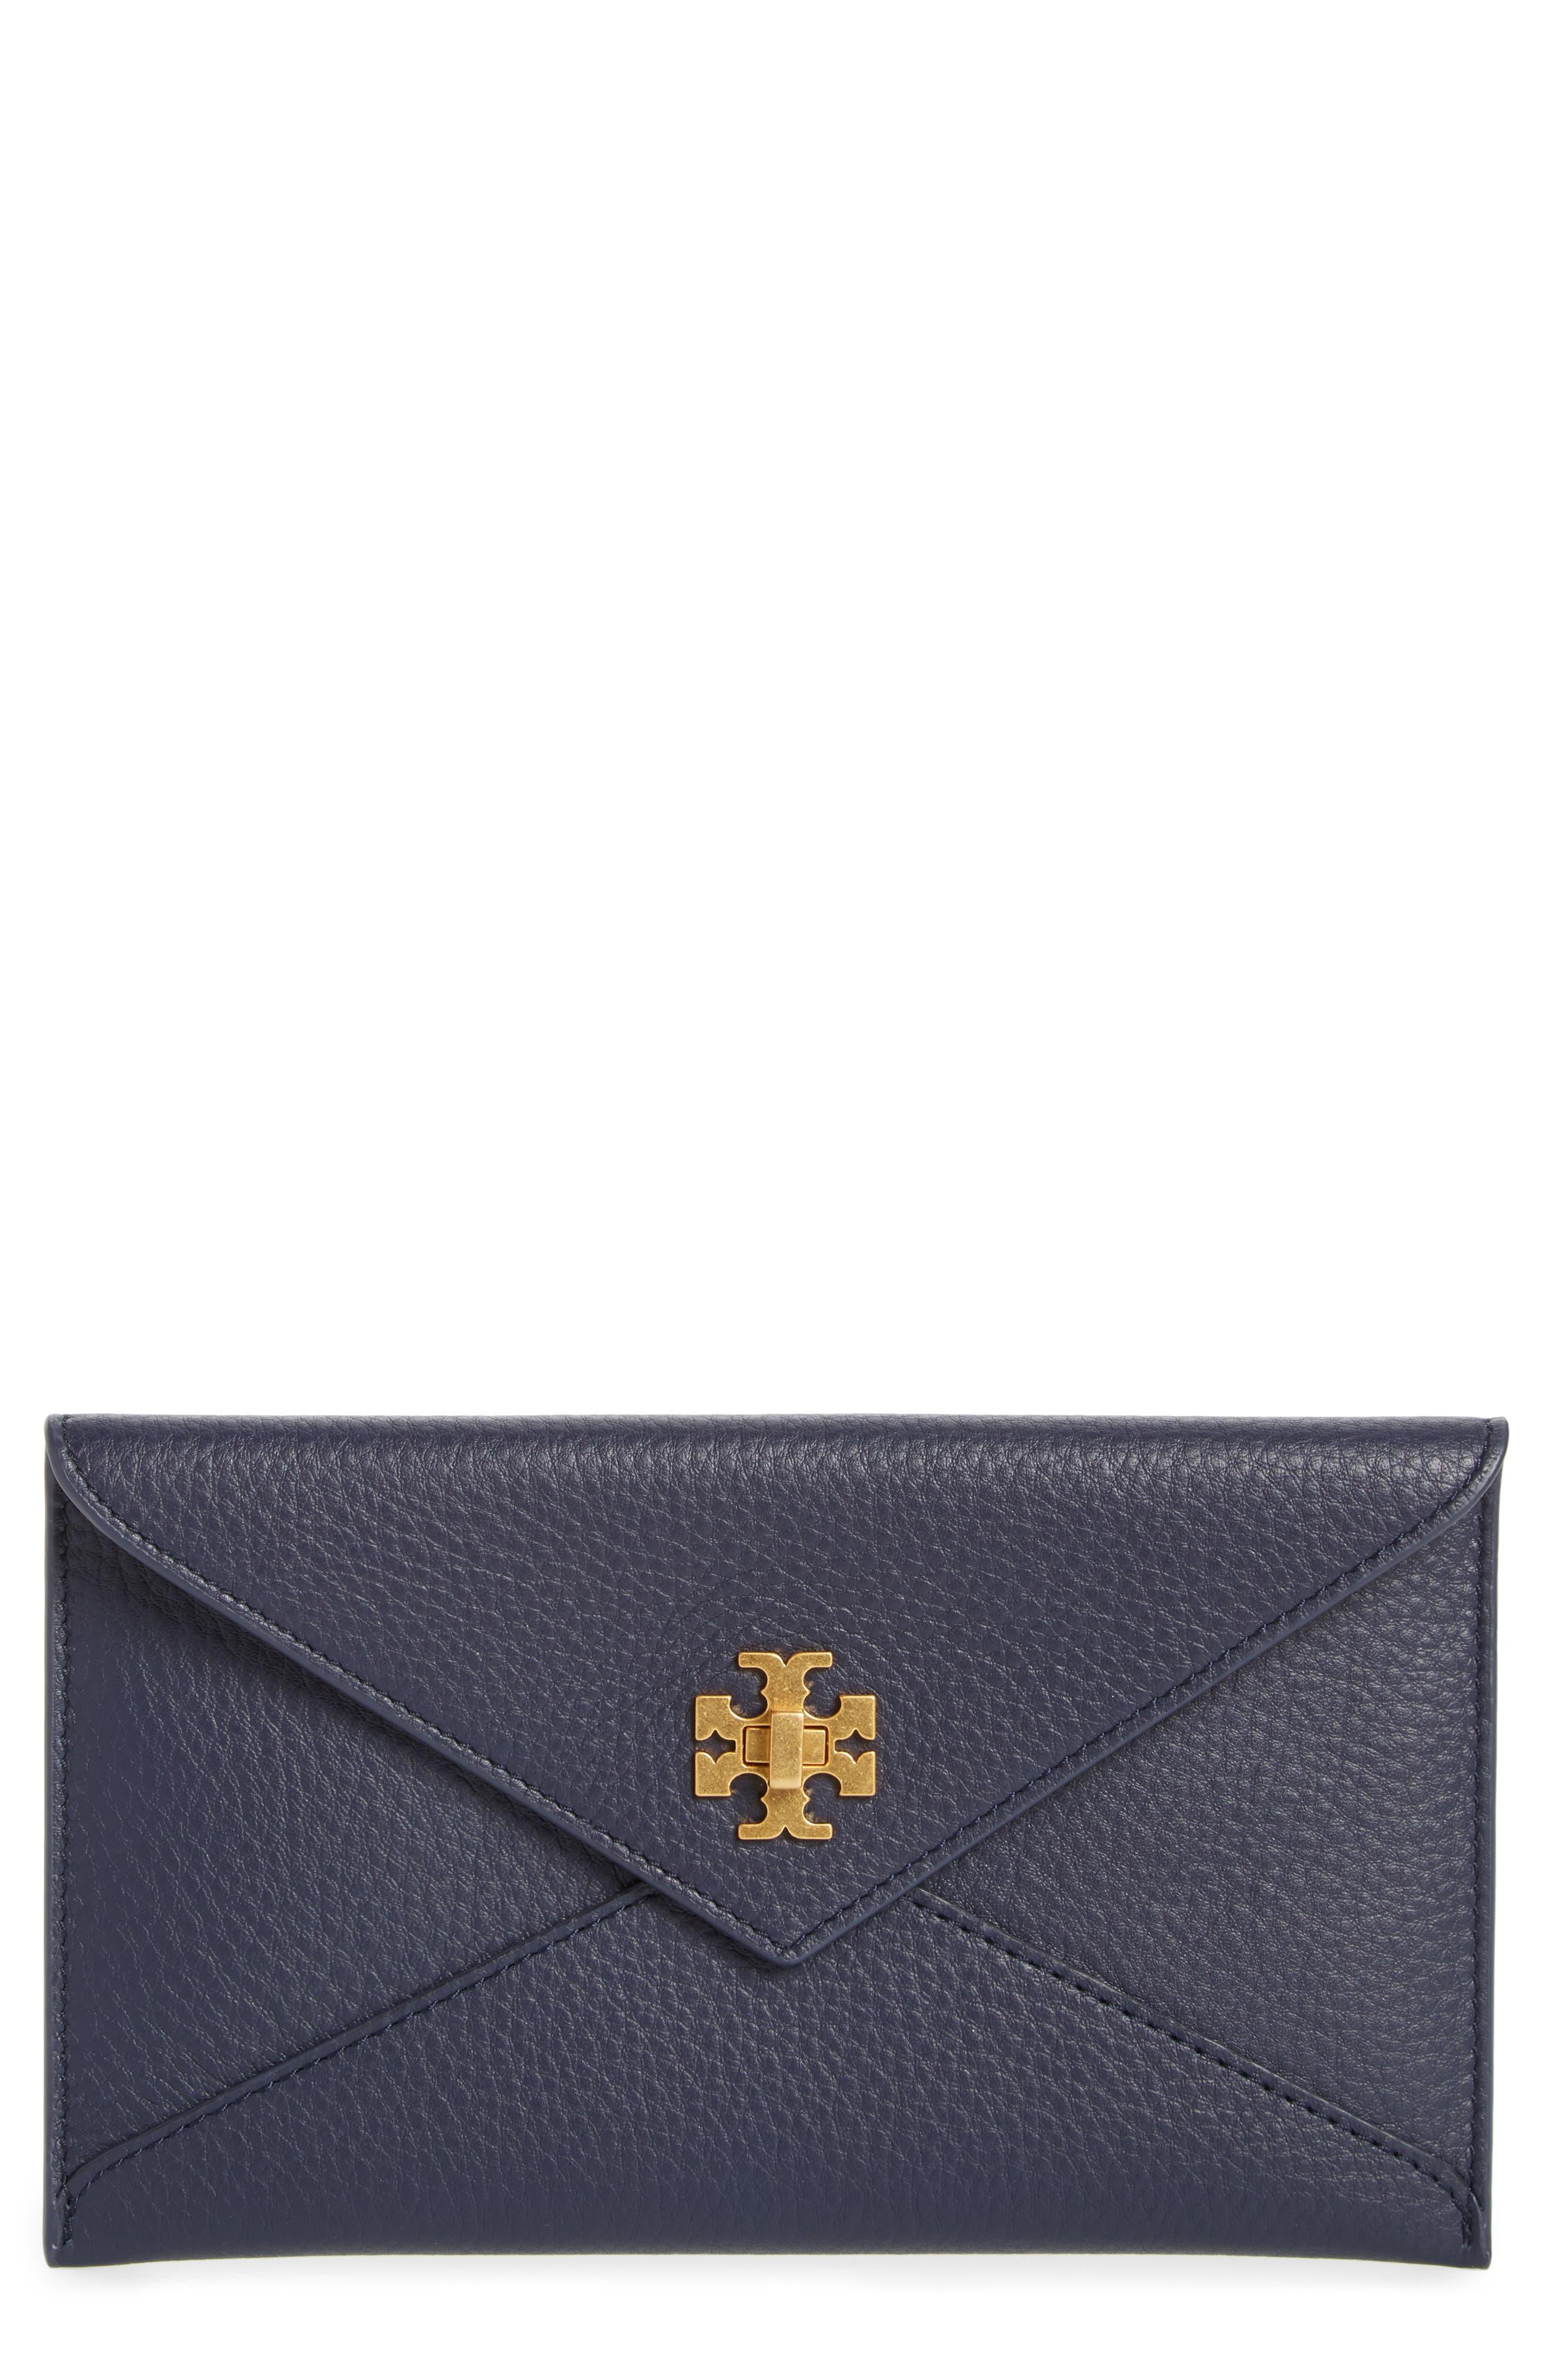 Leather Envelope Clutch,                             Main thumbnail 1, color,                             400